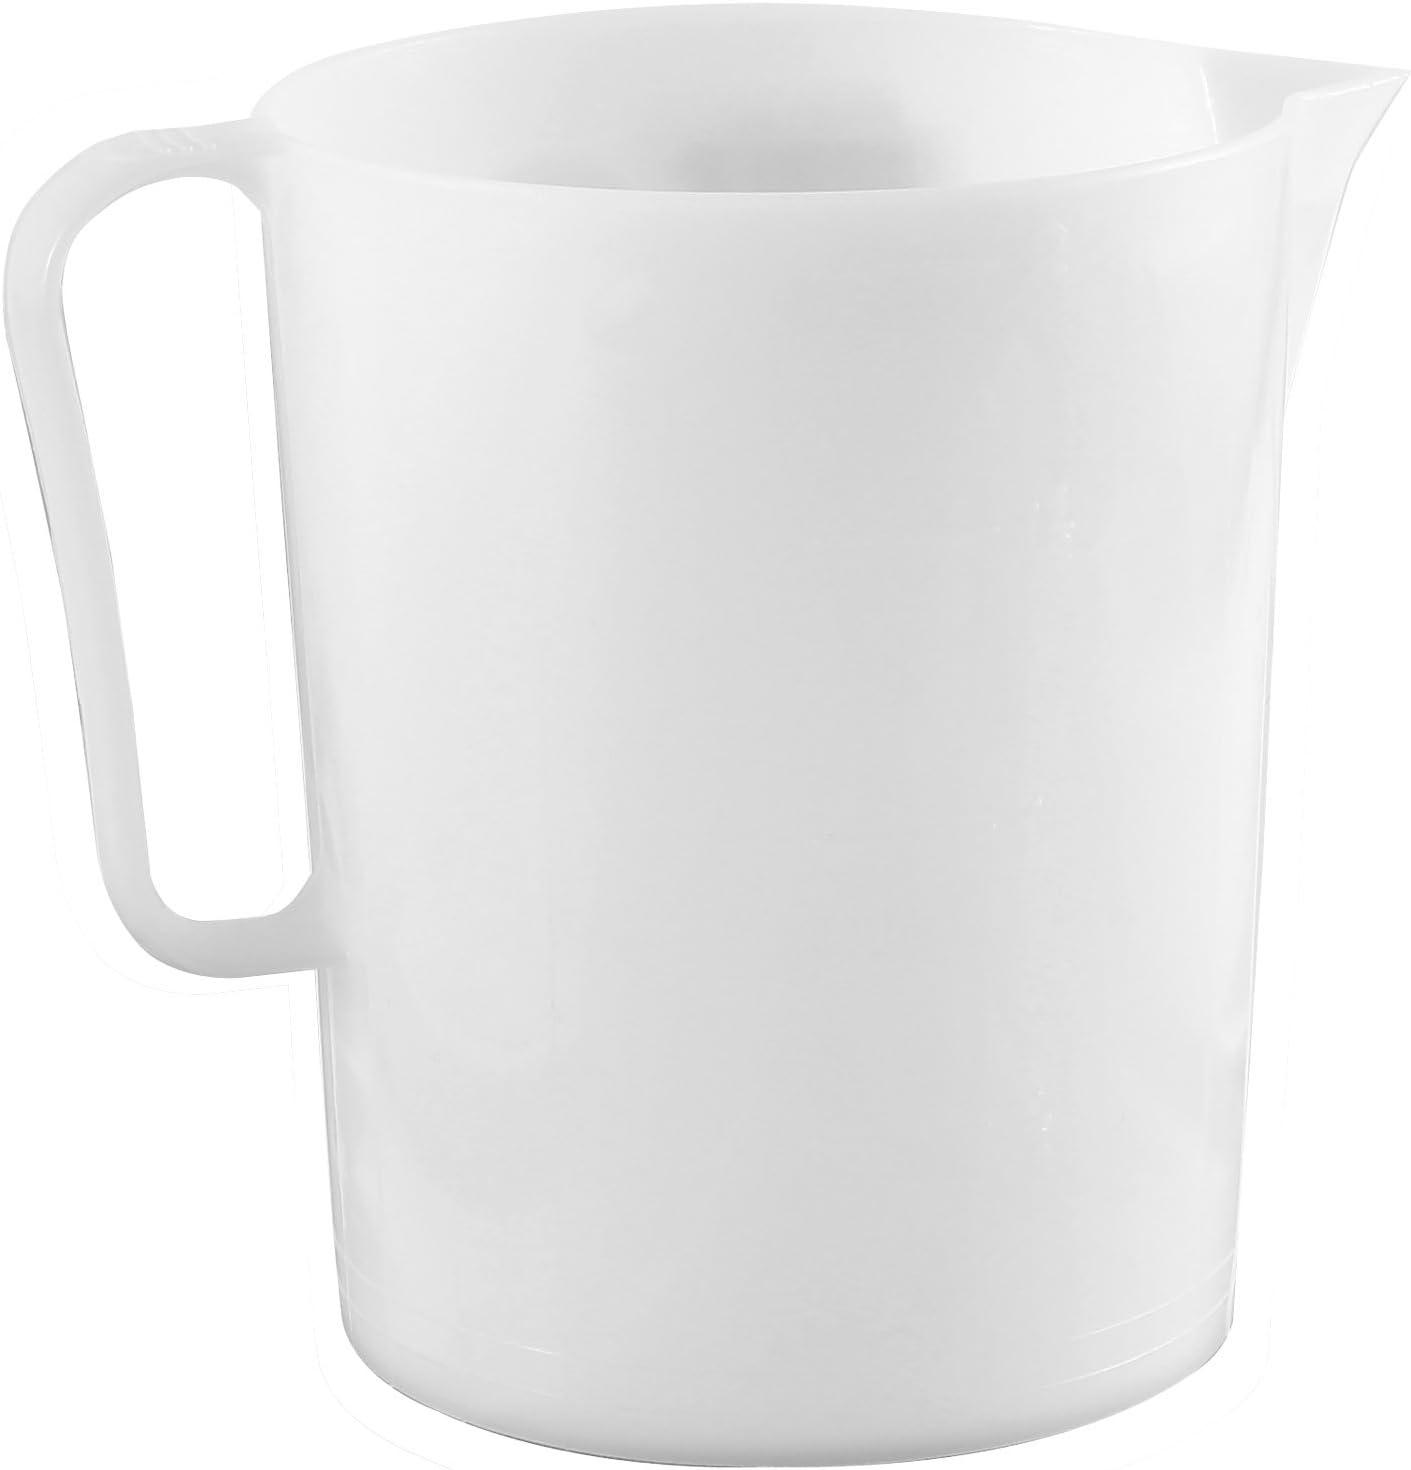 Giganplast Gig Jarra medidora, 4L, Polietileno, Color Blanco